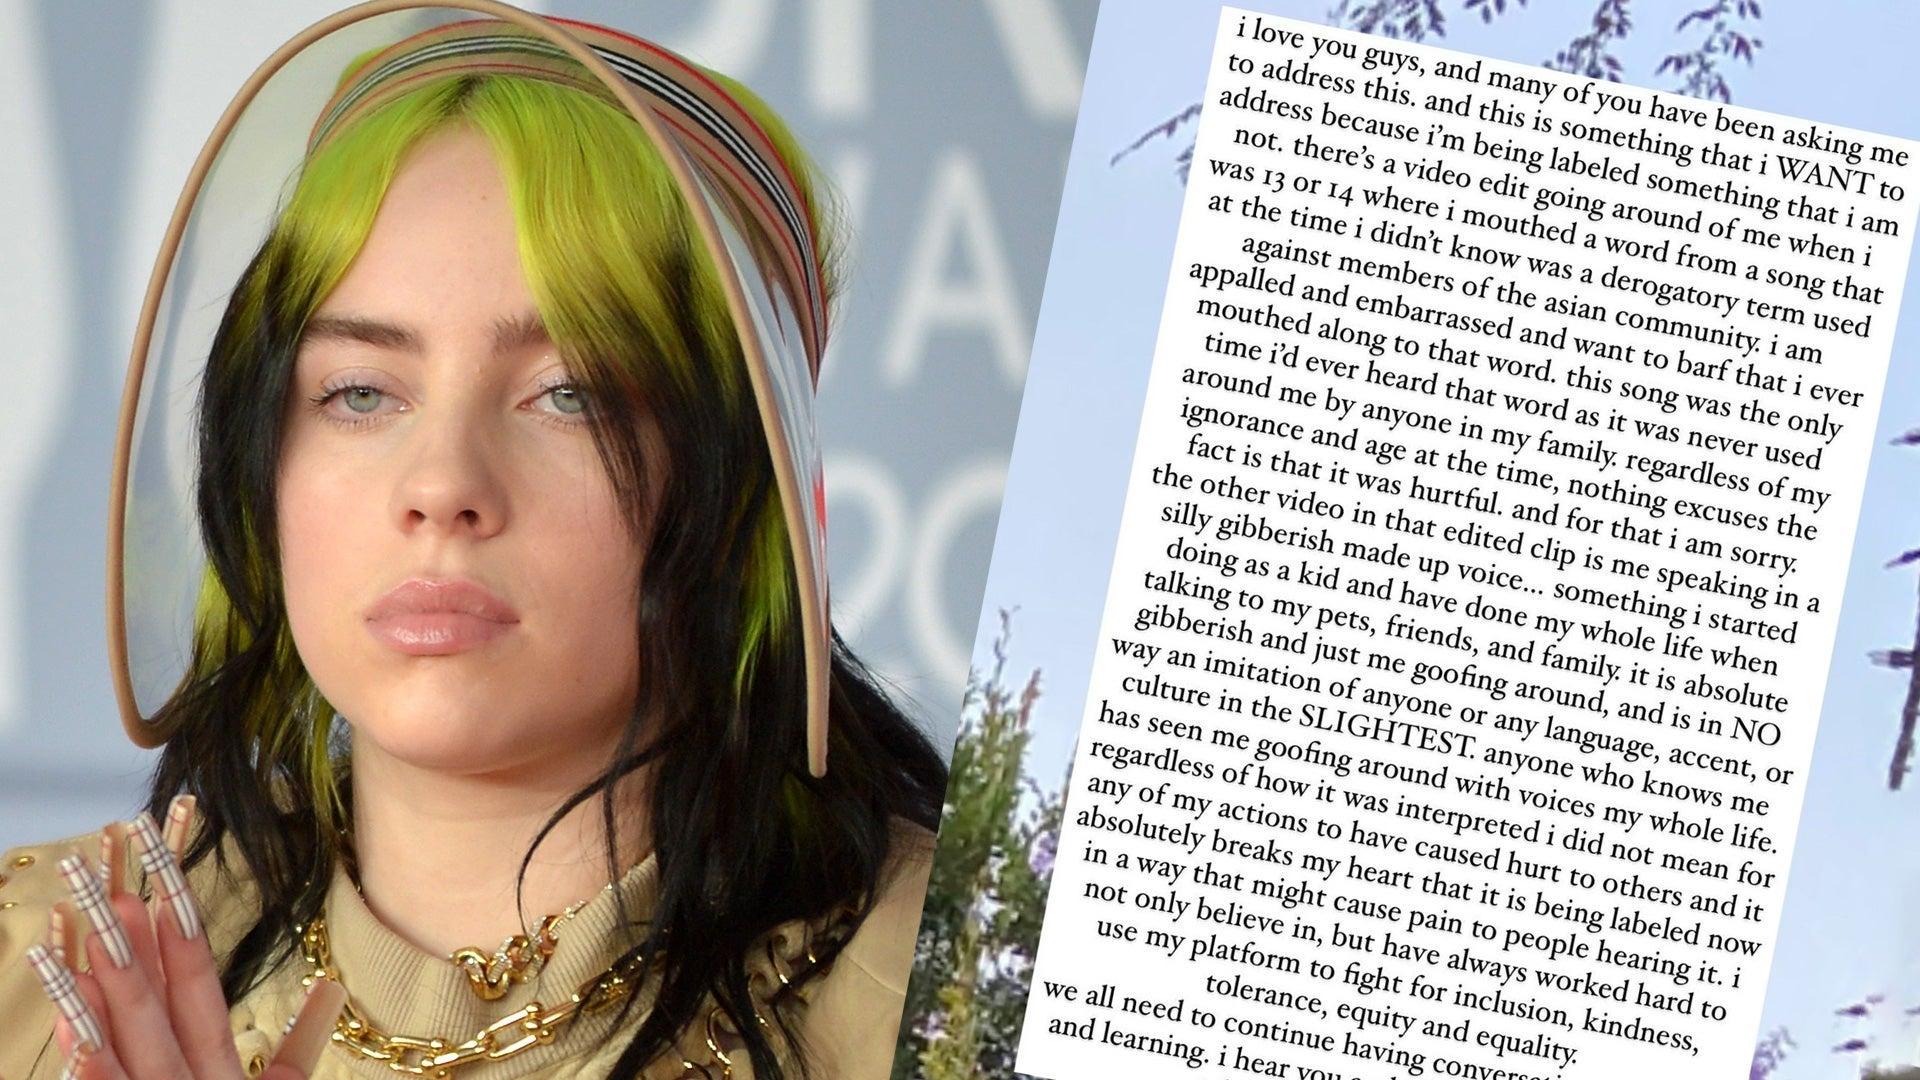 Travis Scott and Kylie Jenner confirm pregnancy - REVOLT